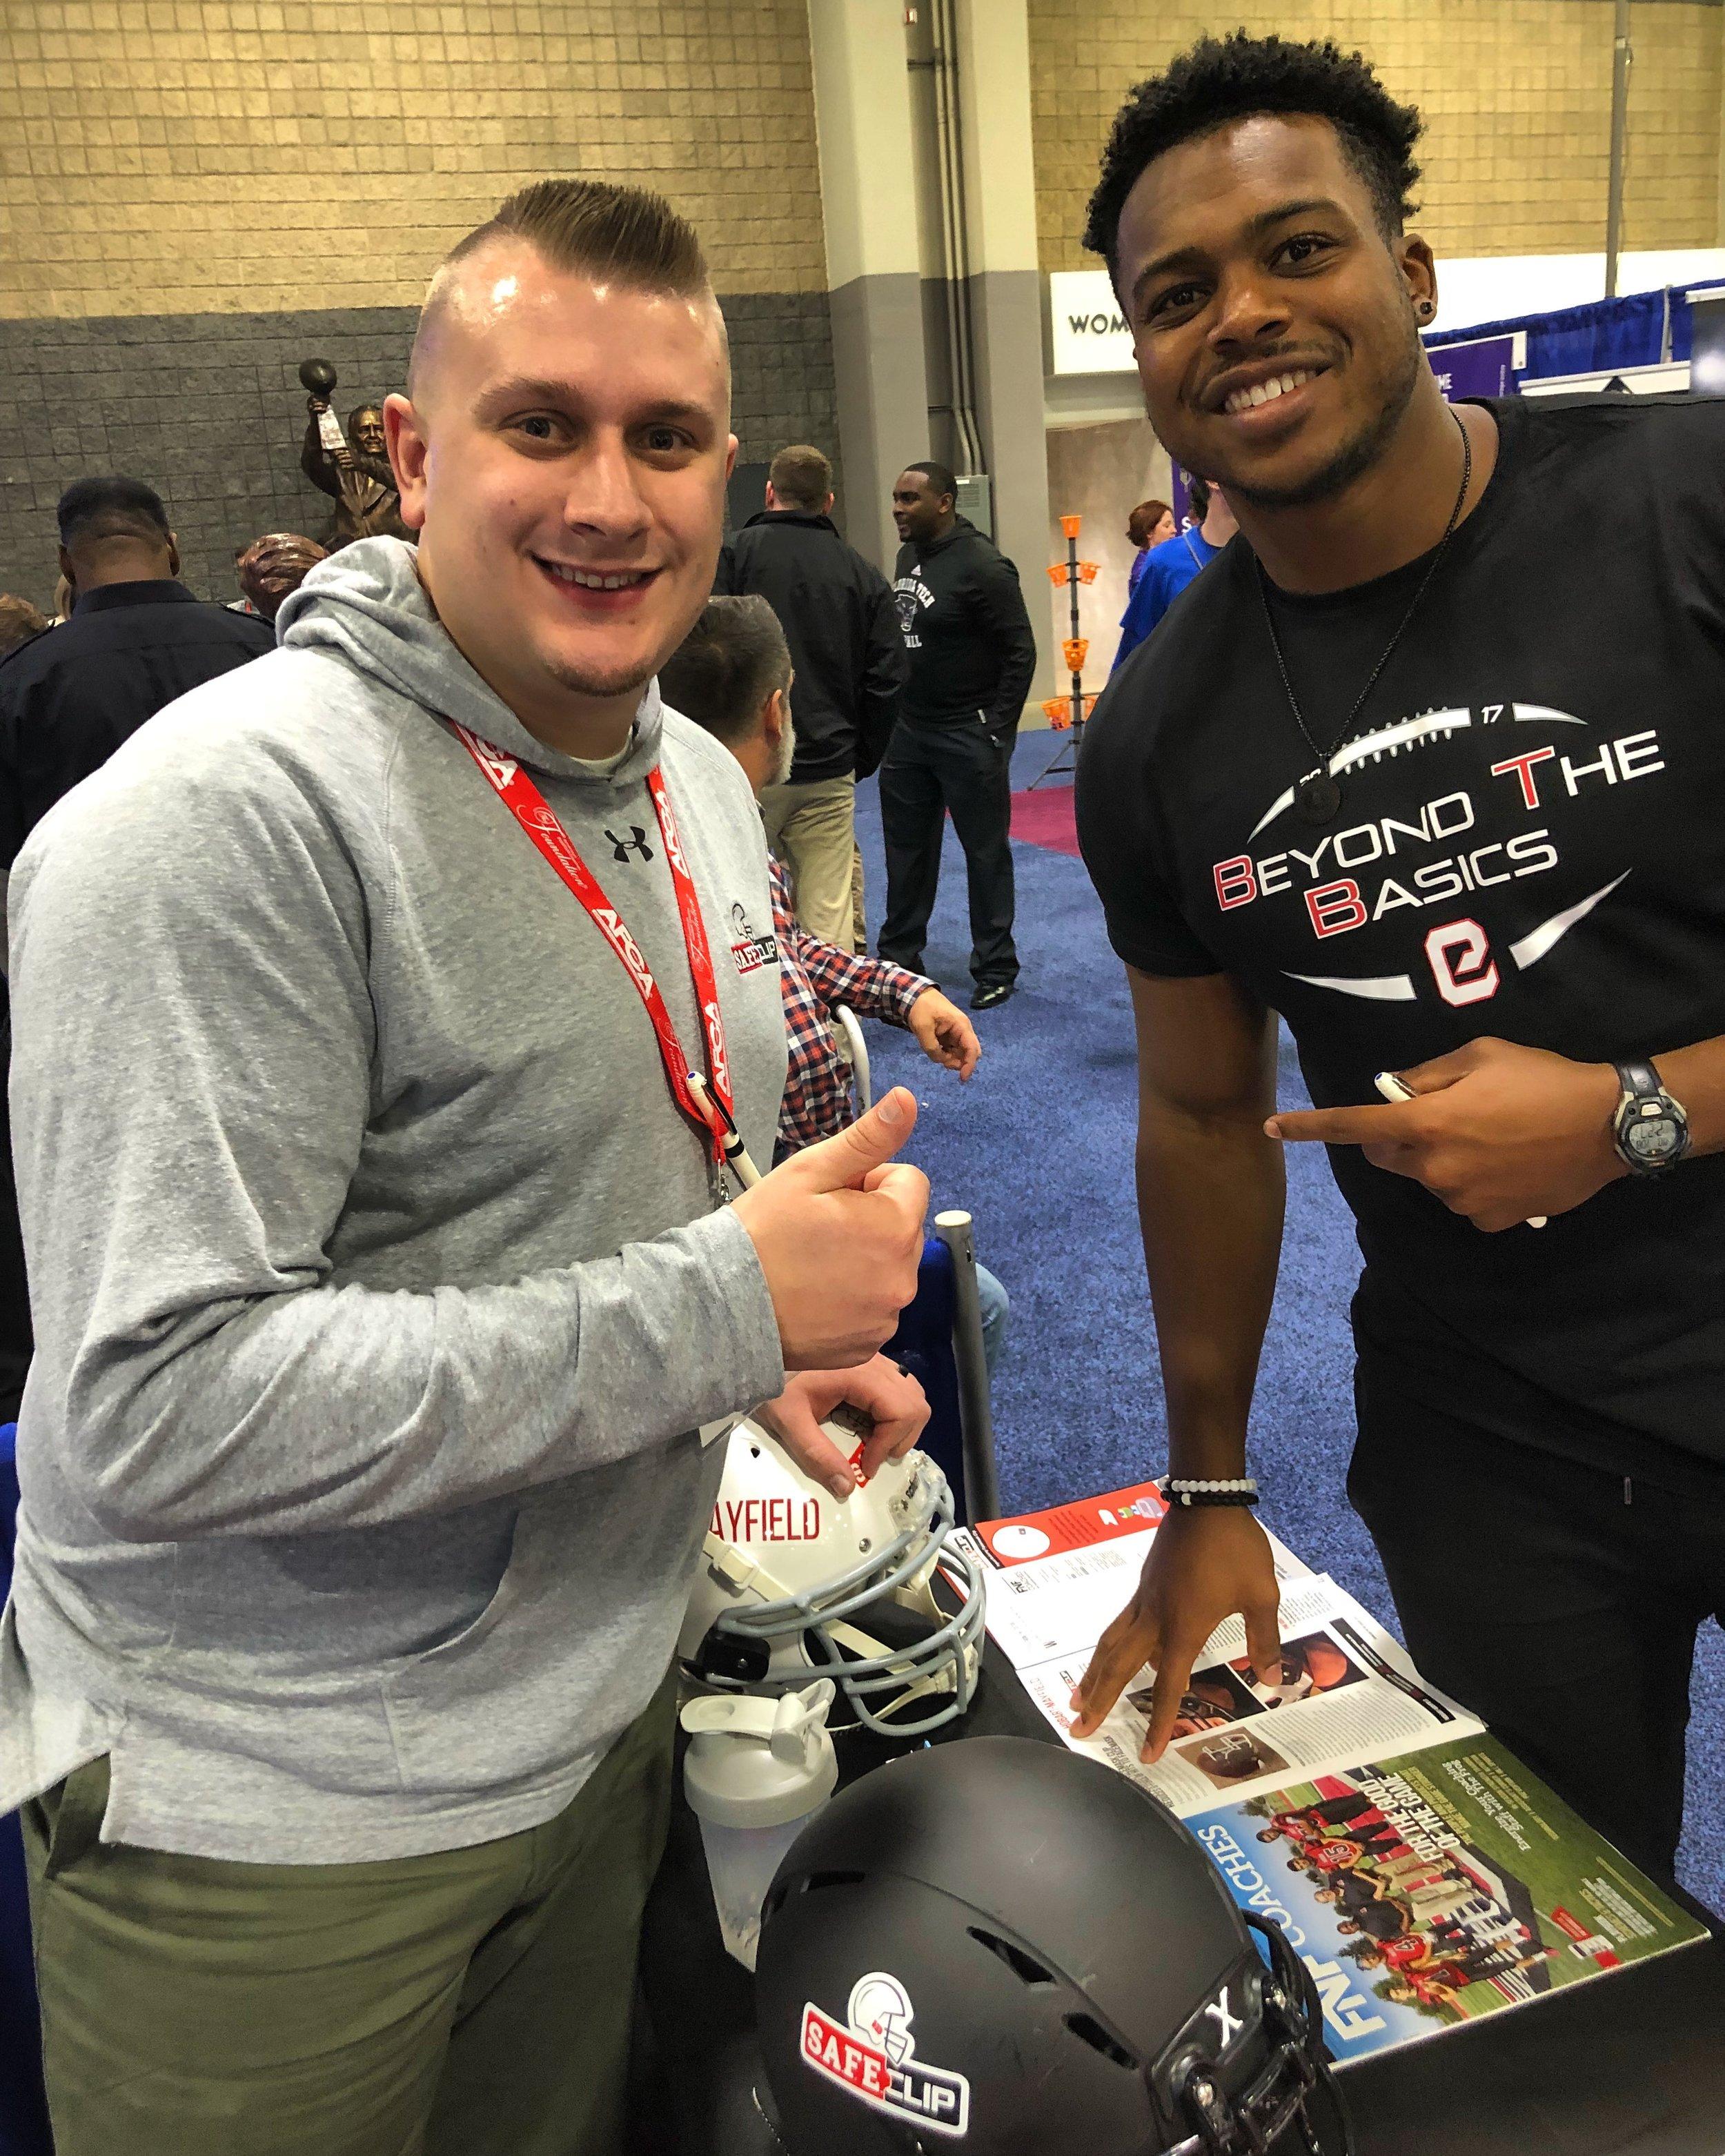 SAFEClip with Brandon Copeland (NFL Line Backer) at AFCA convention